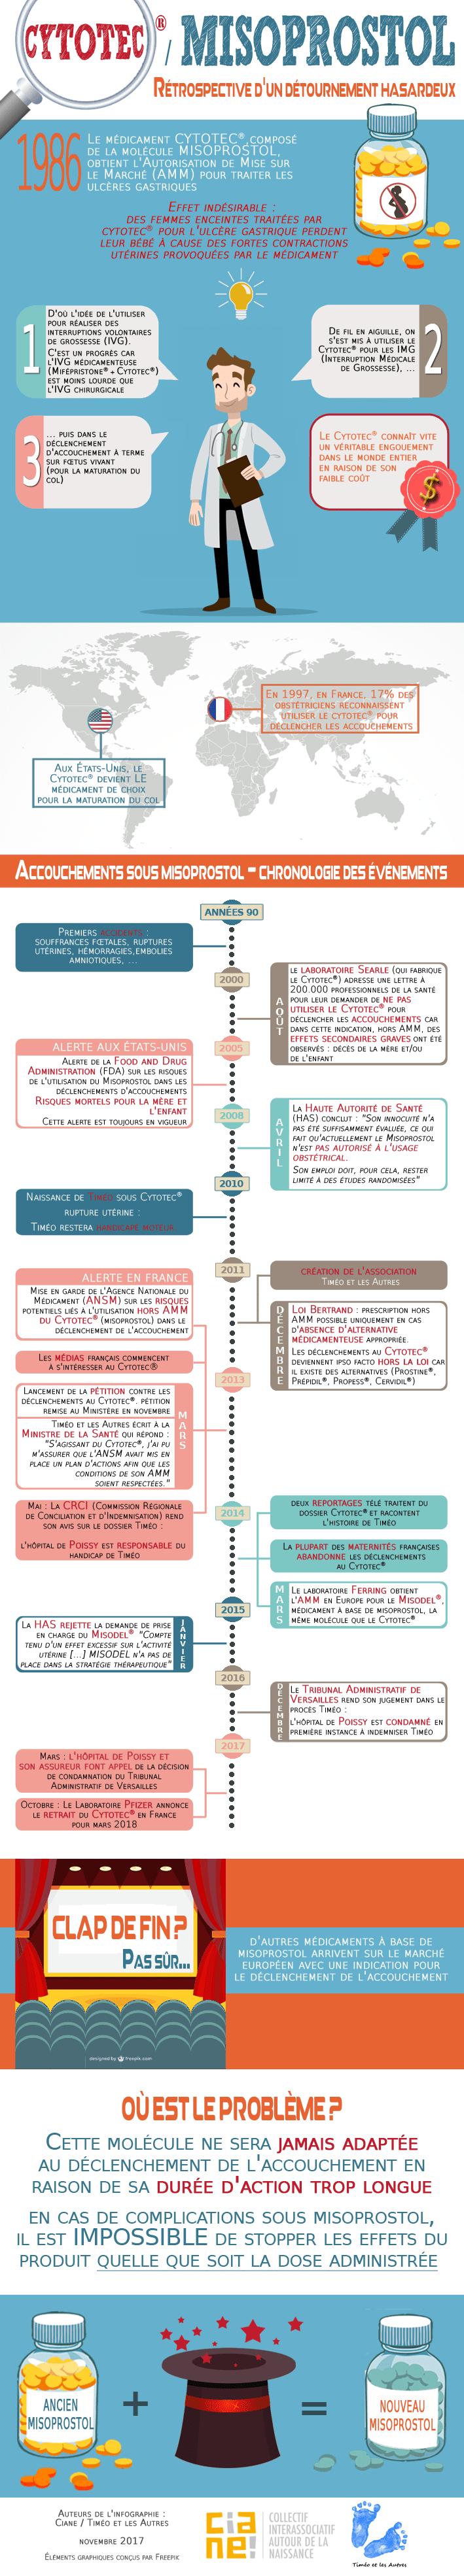 infographie cytotec misoprostol ciane timéo 2017